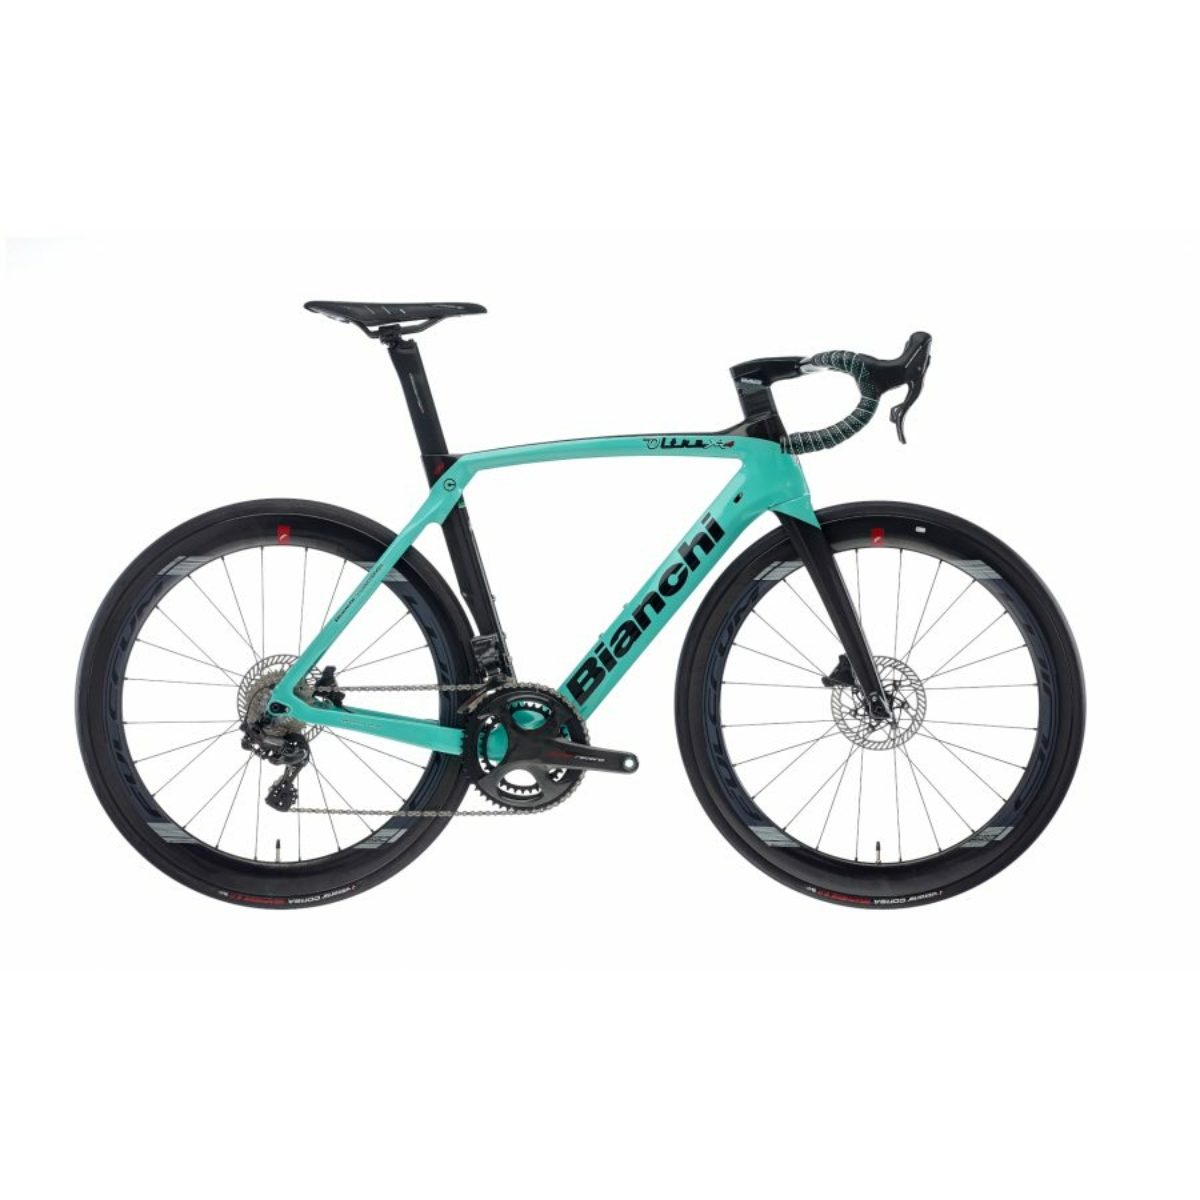 BIANCHI OLTRE XR4 DISC - SUPER RECORD EPS 12SP 52/36 (FULCRUM WIND) kerékpár